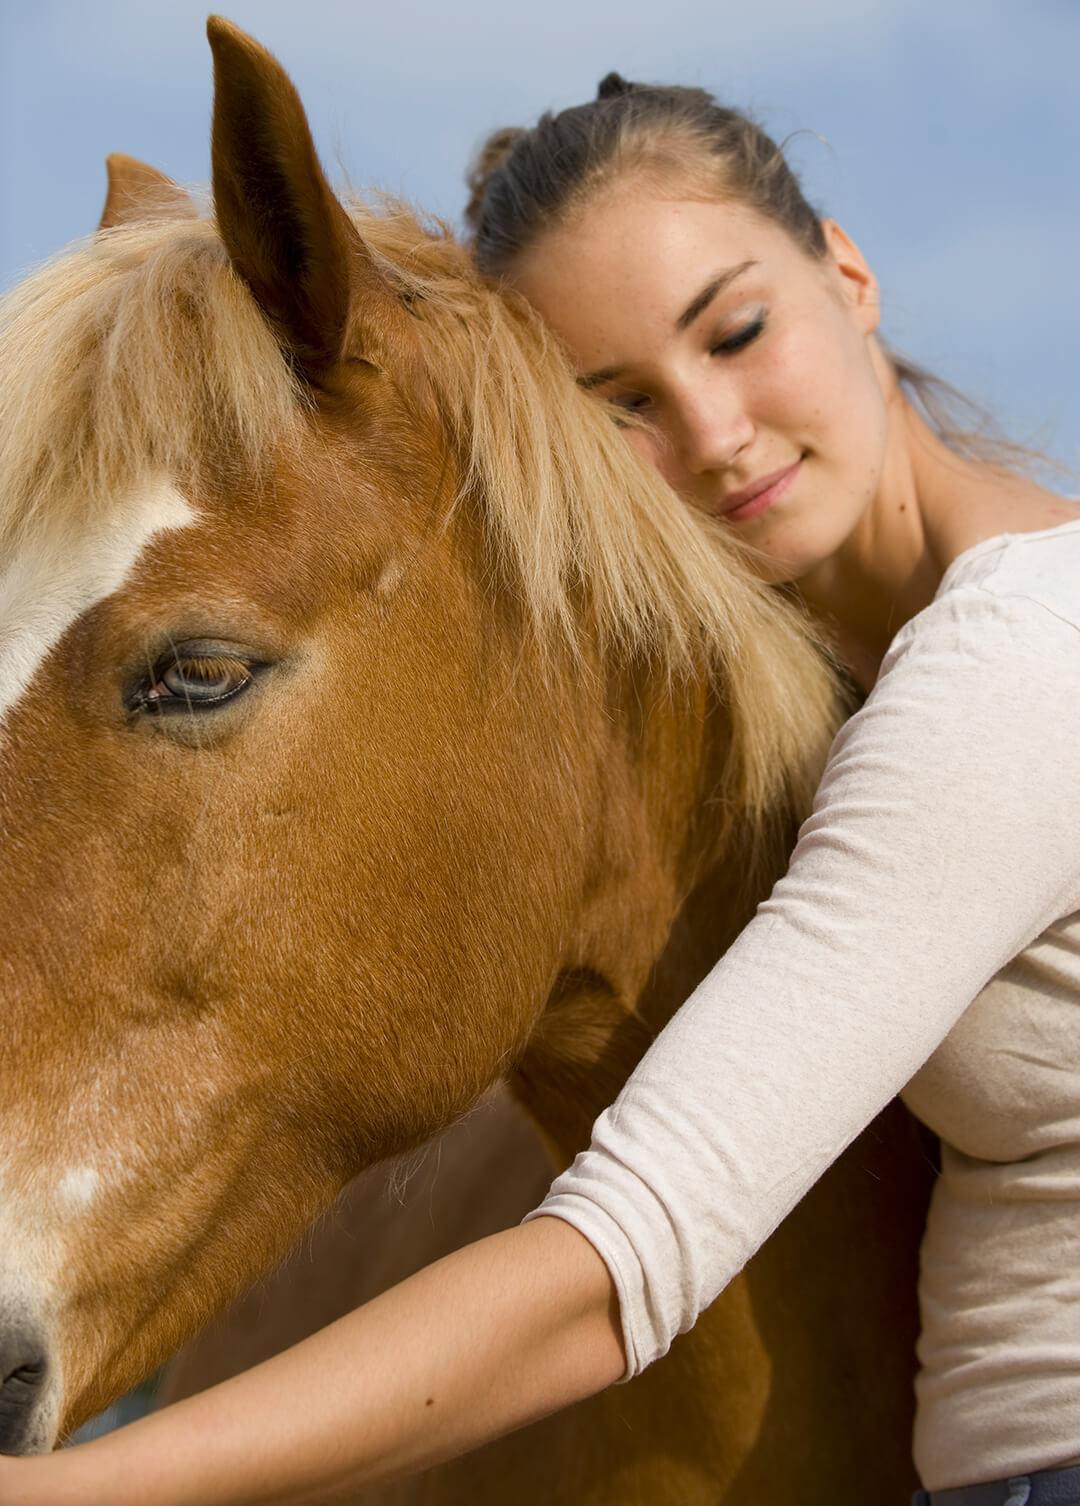 aimer le cheval